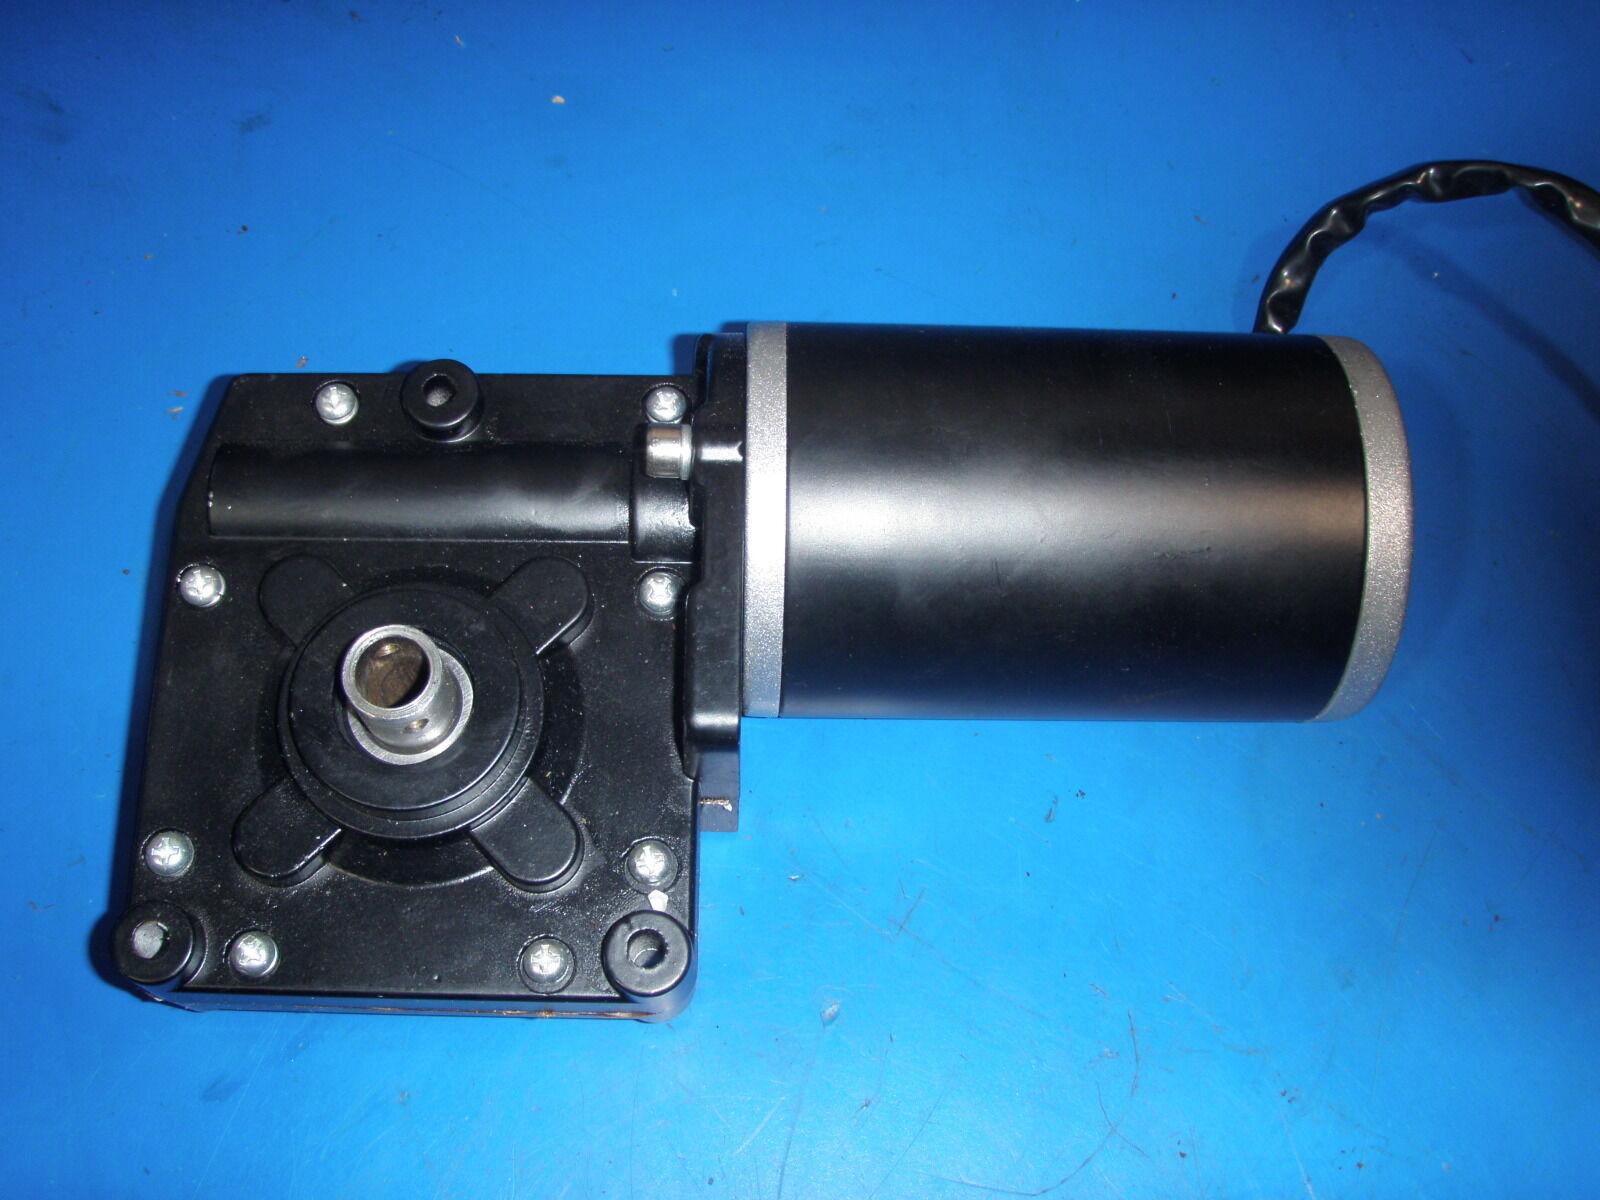 GEAR MOTOR 150 WATT 12 VOLT 190-200 RPM REVERSIBLE BRAND NEW 12 VDC